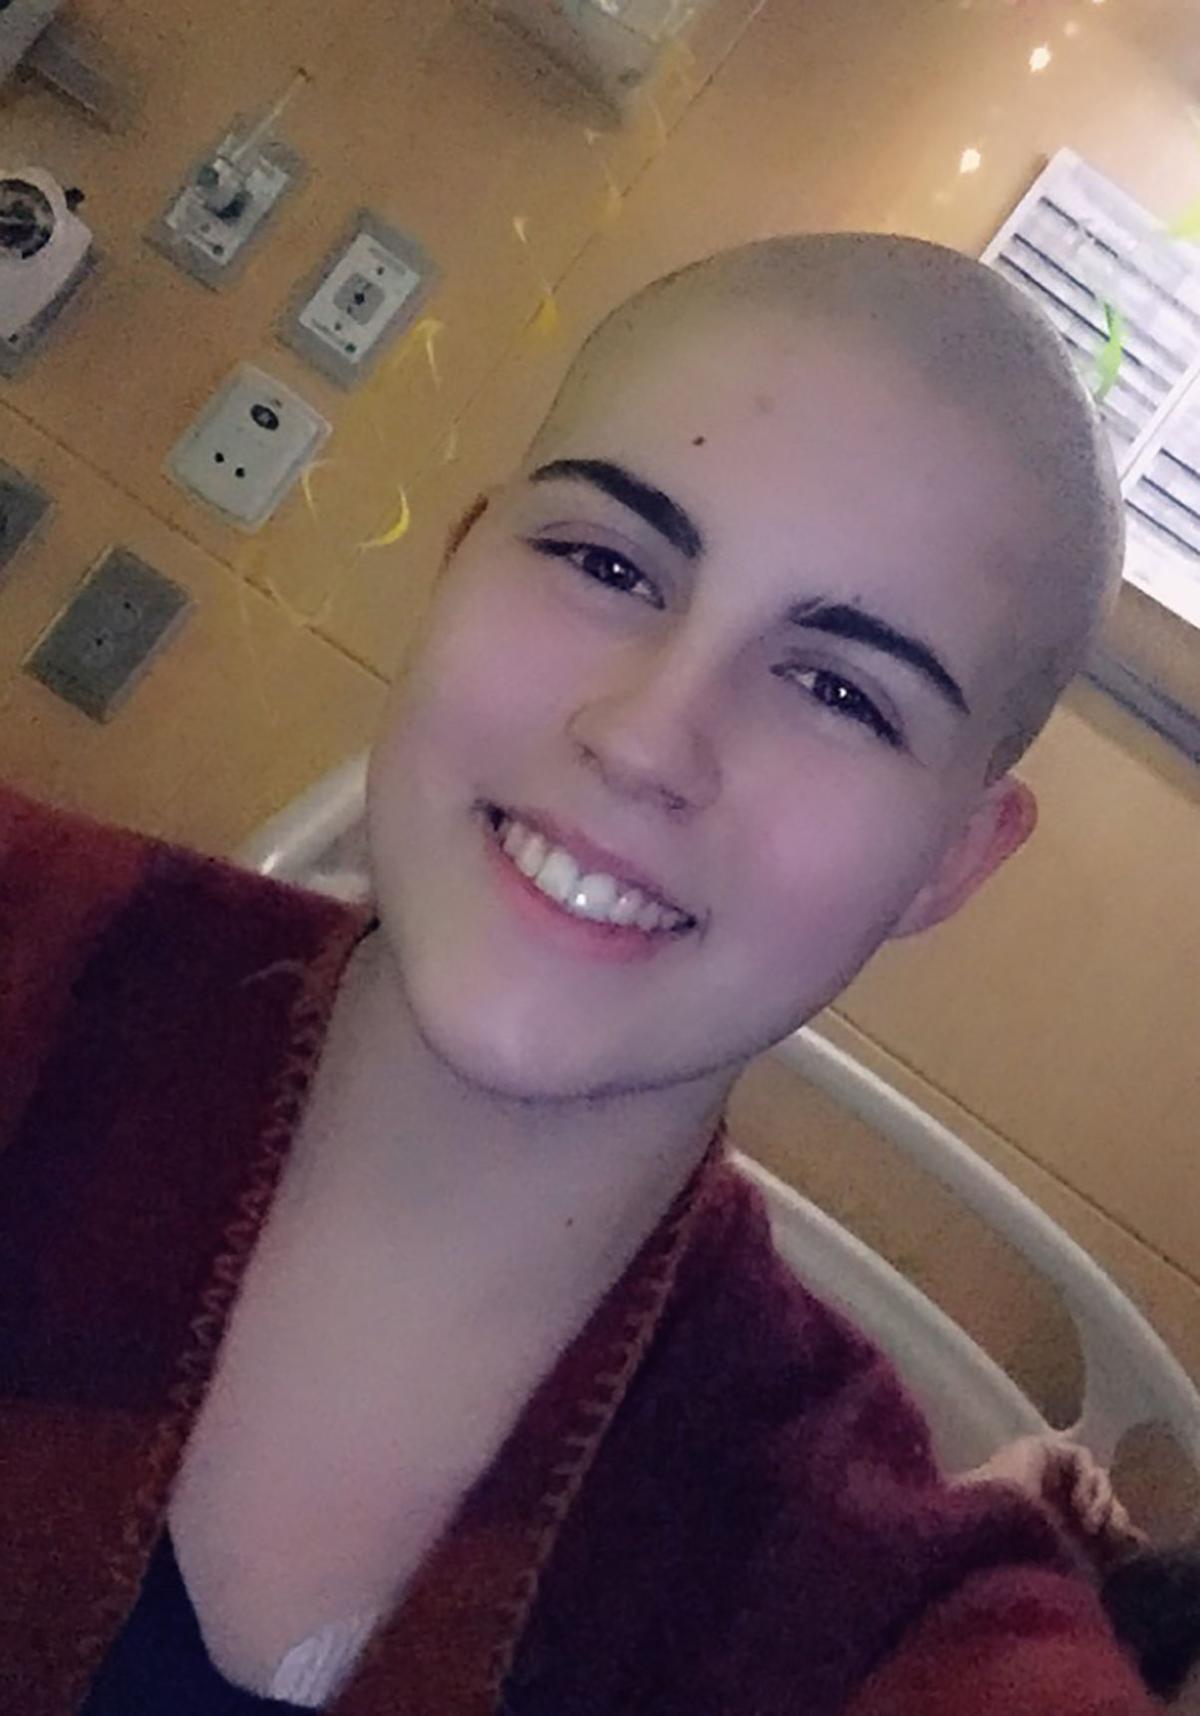 210228-yh-ul-cancermoira-1.jpg